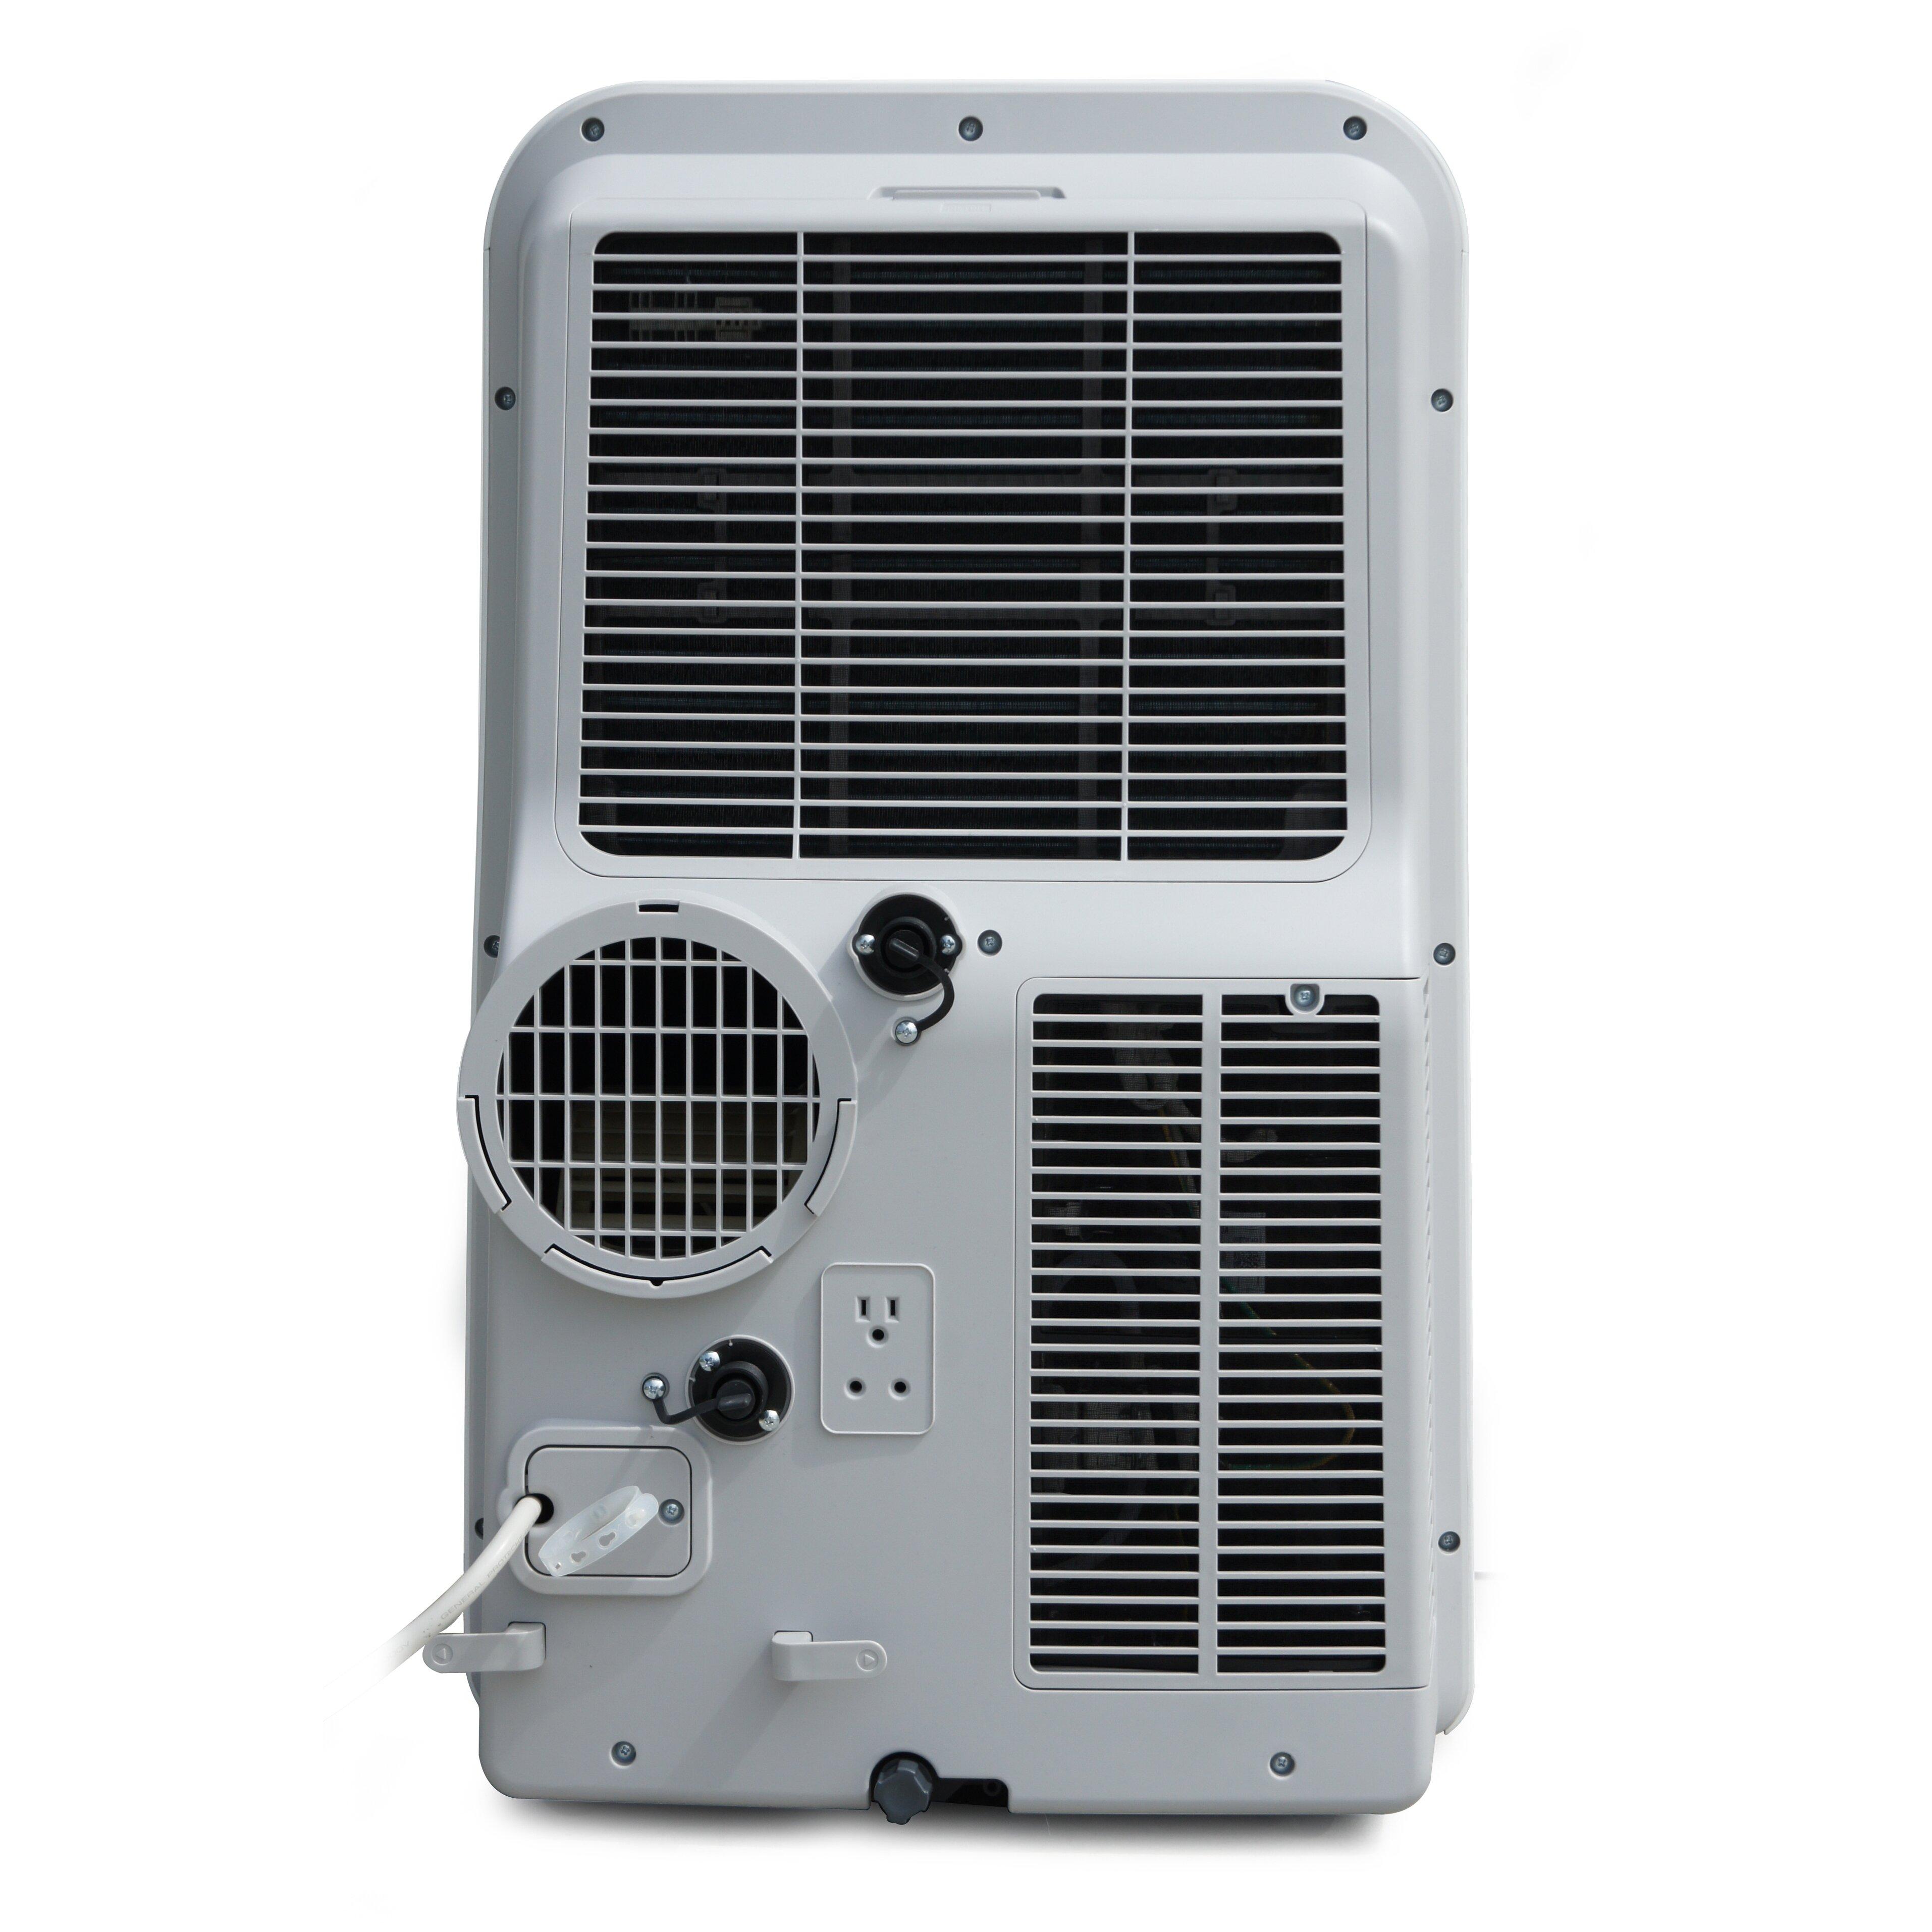 Sunpentown 14 000 btu portable air conditioner reviews for 14 000 btu window air conditioner